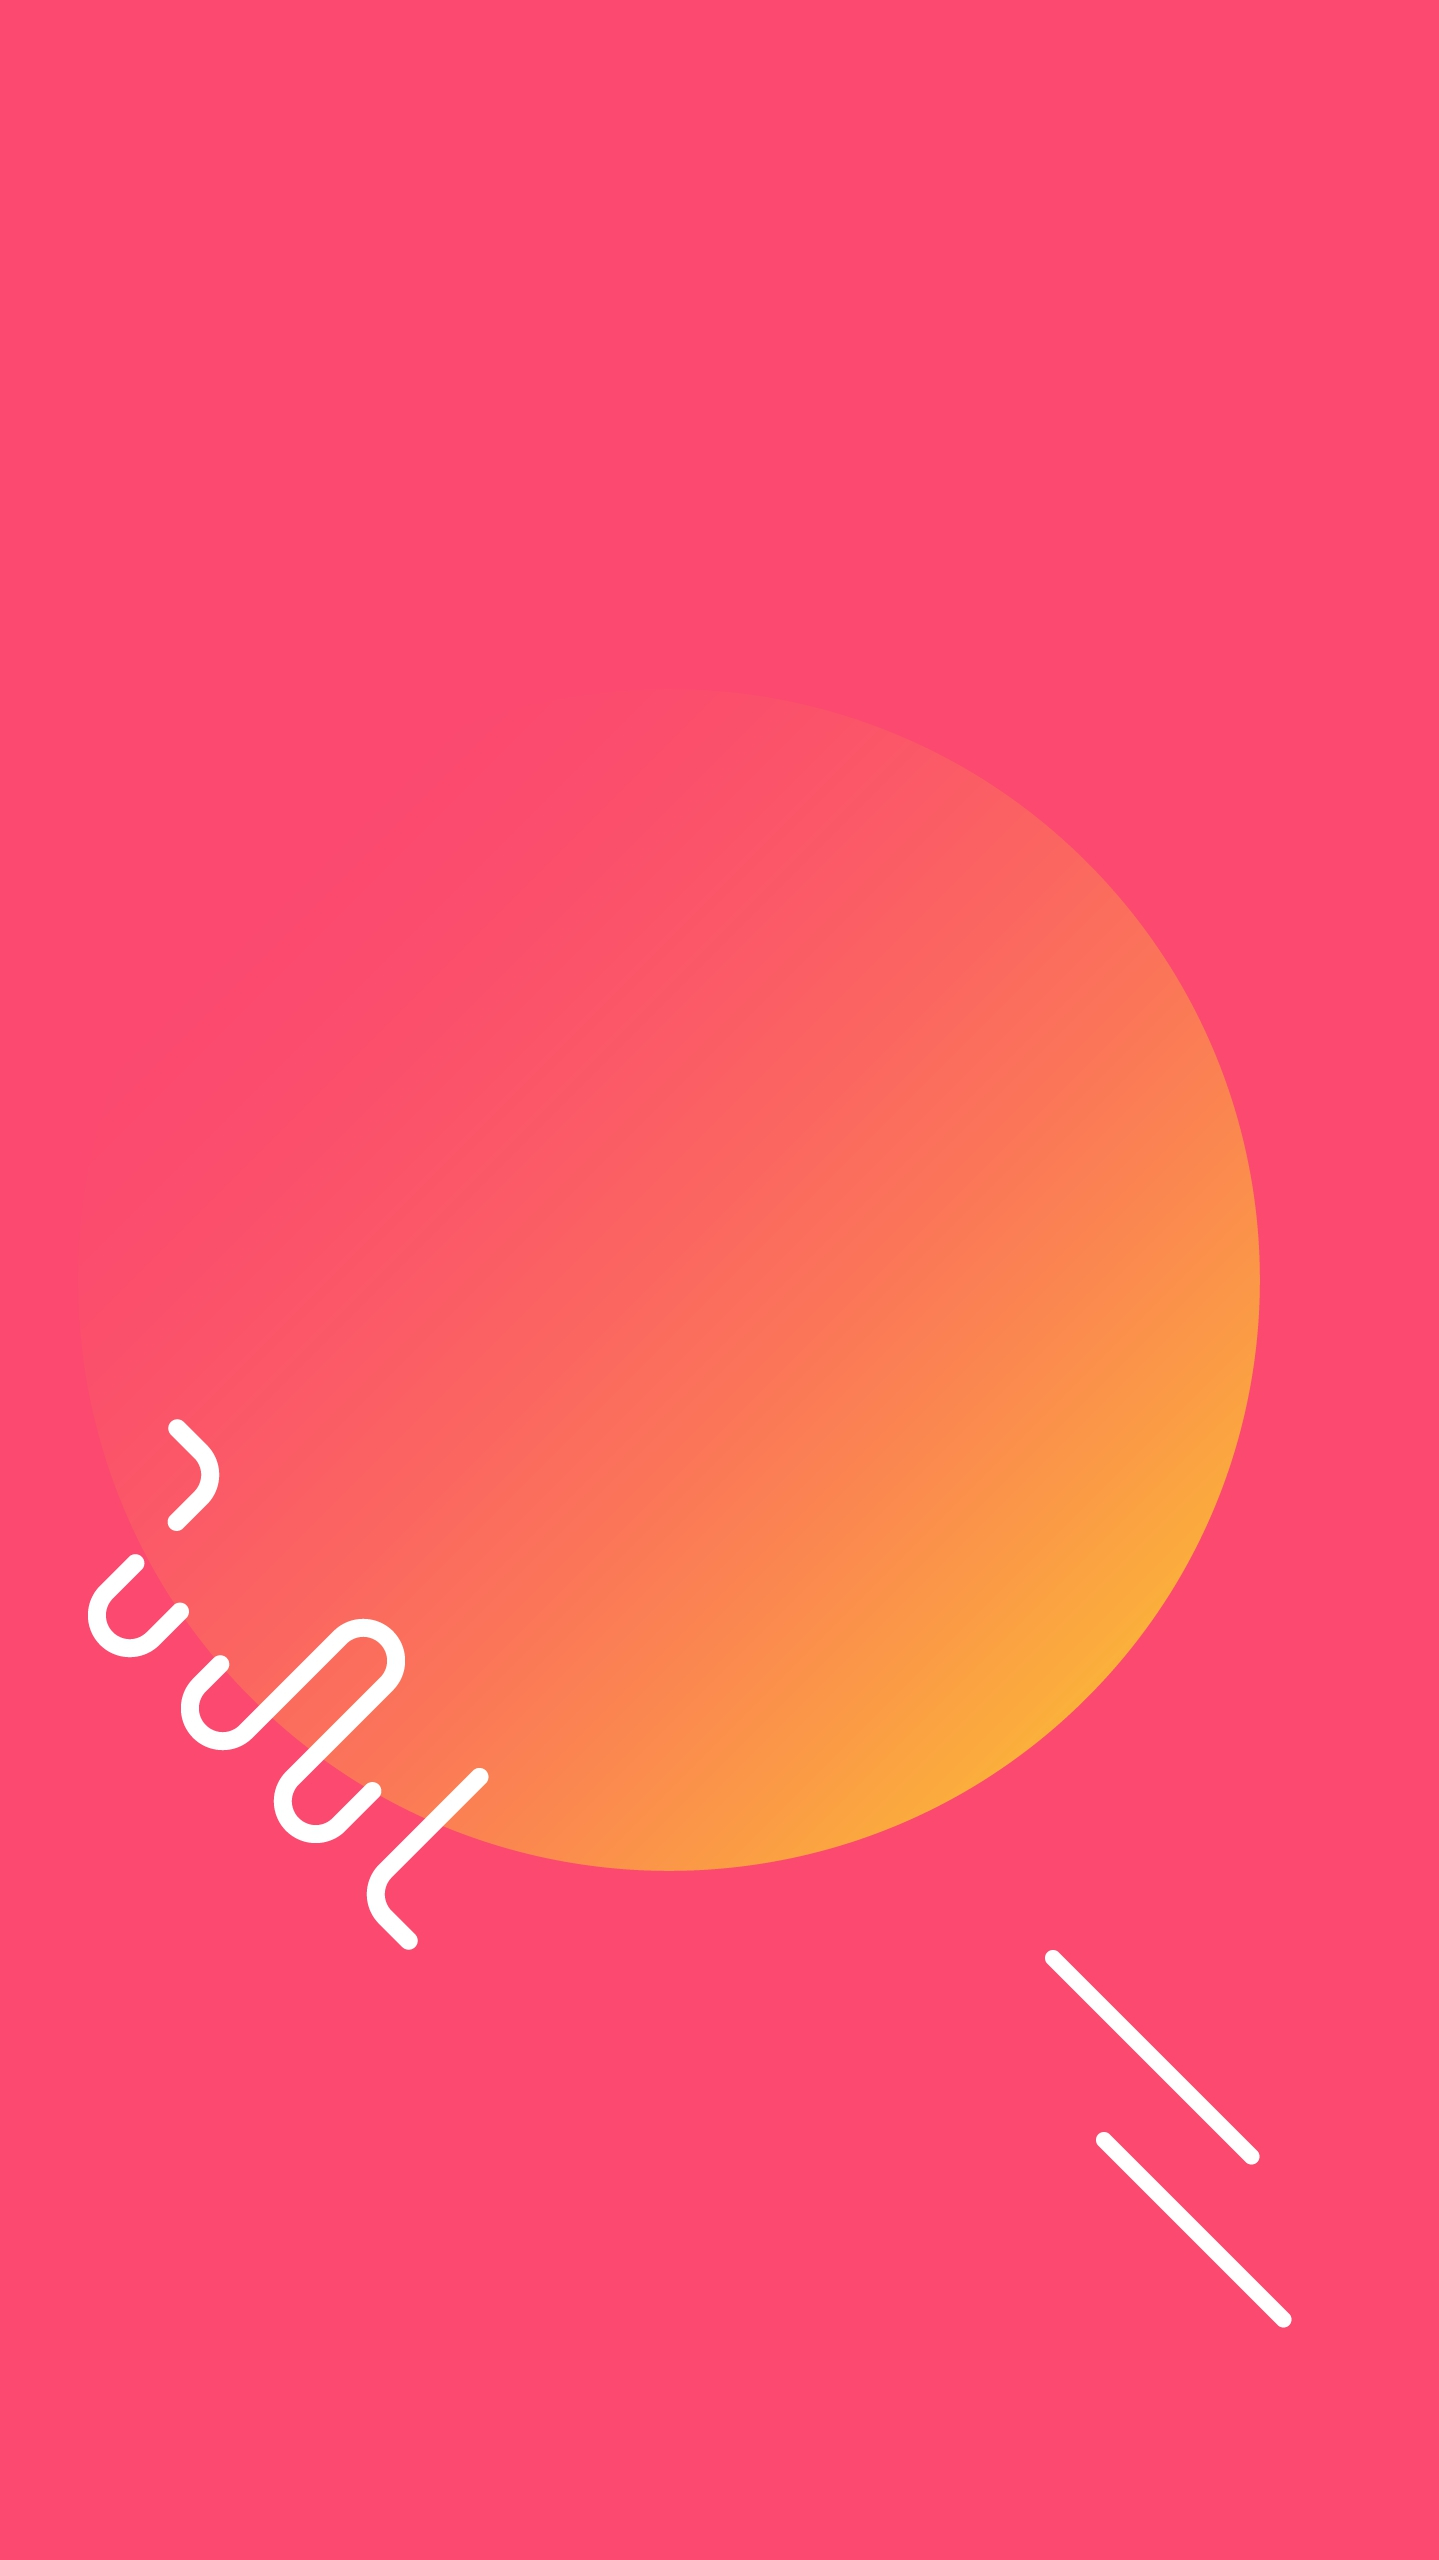 Simple Sun iPhone Wallpaper